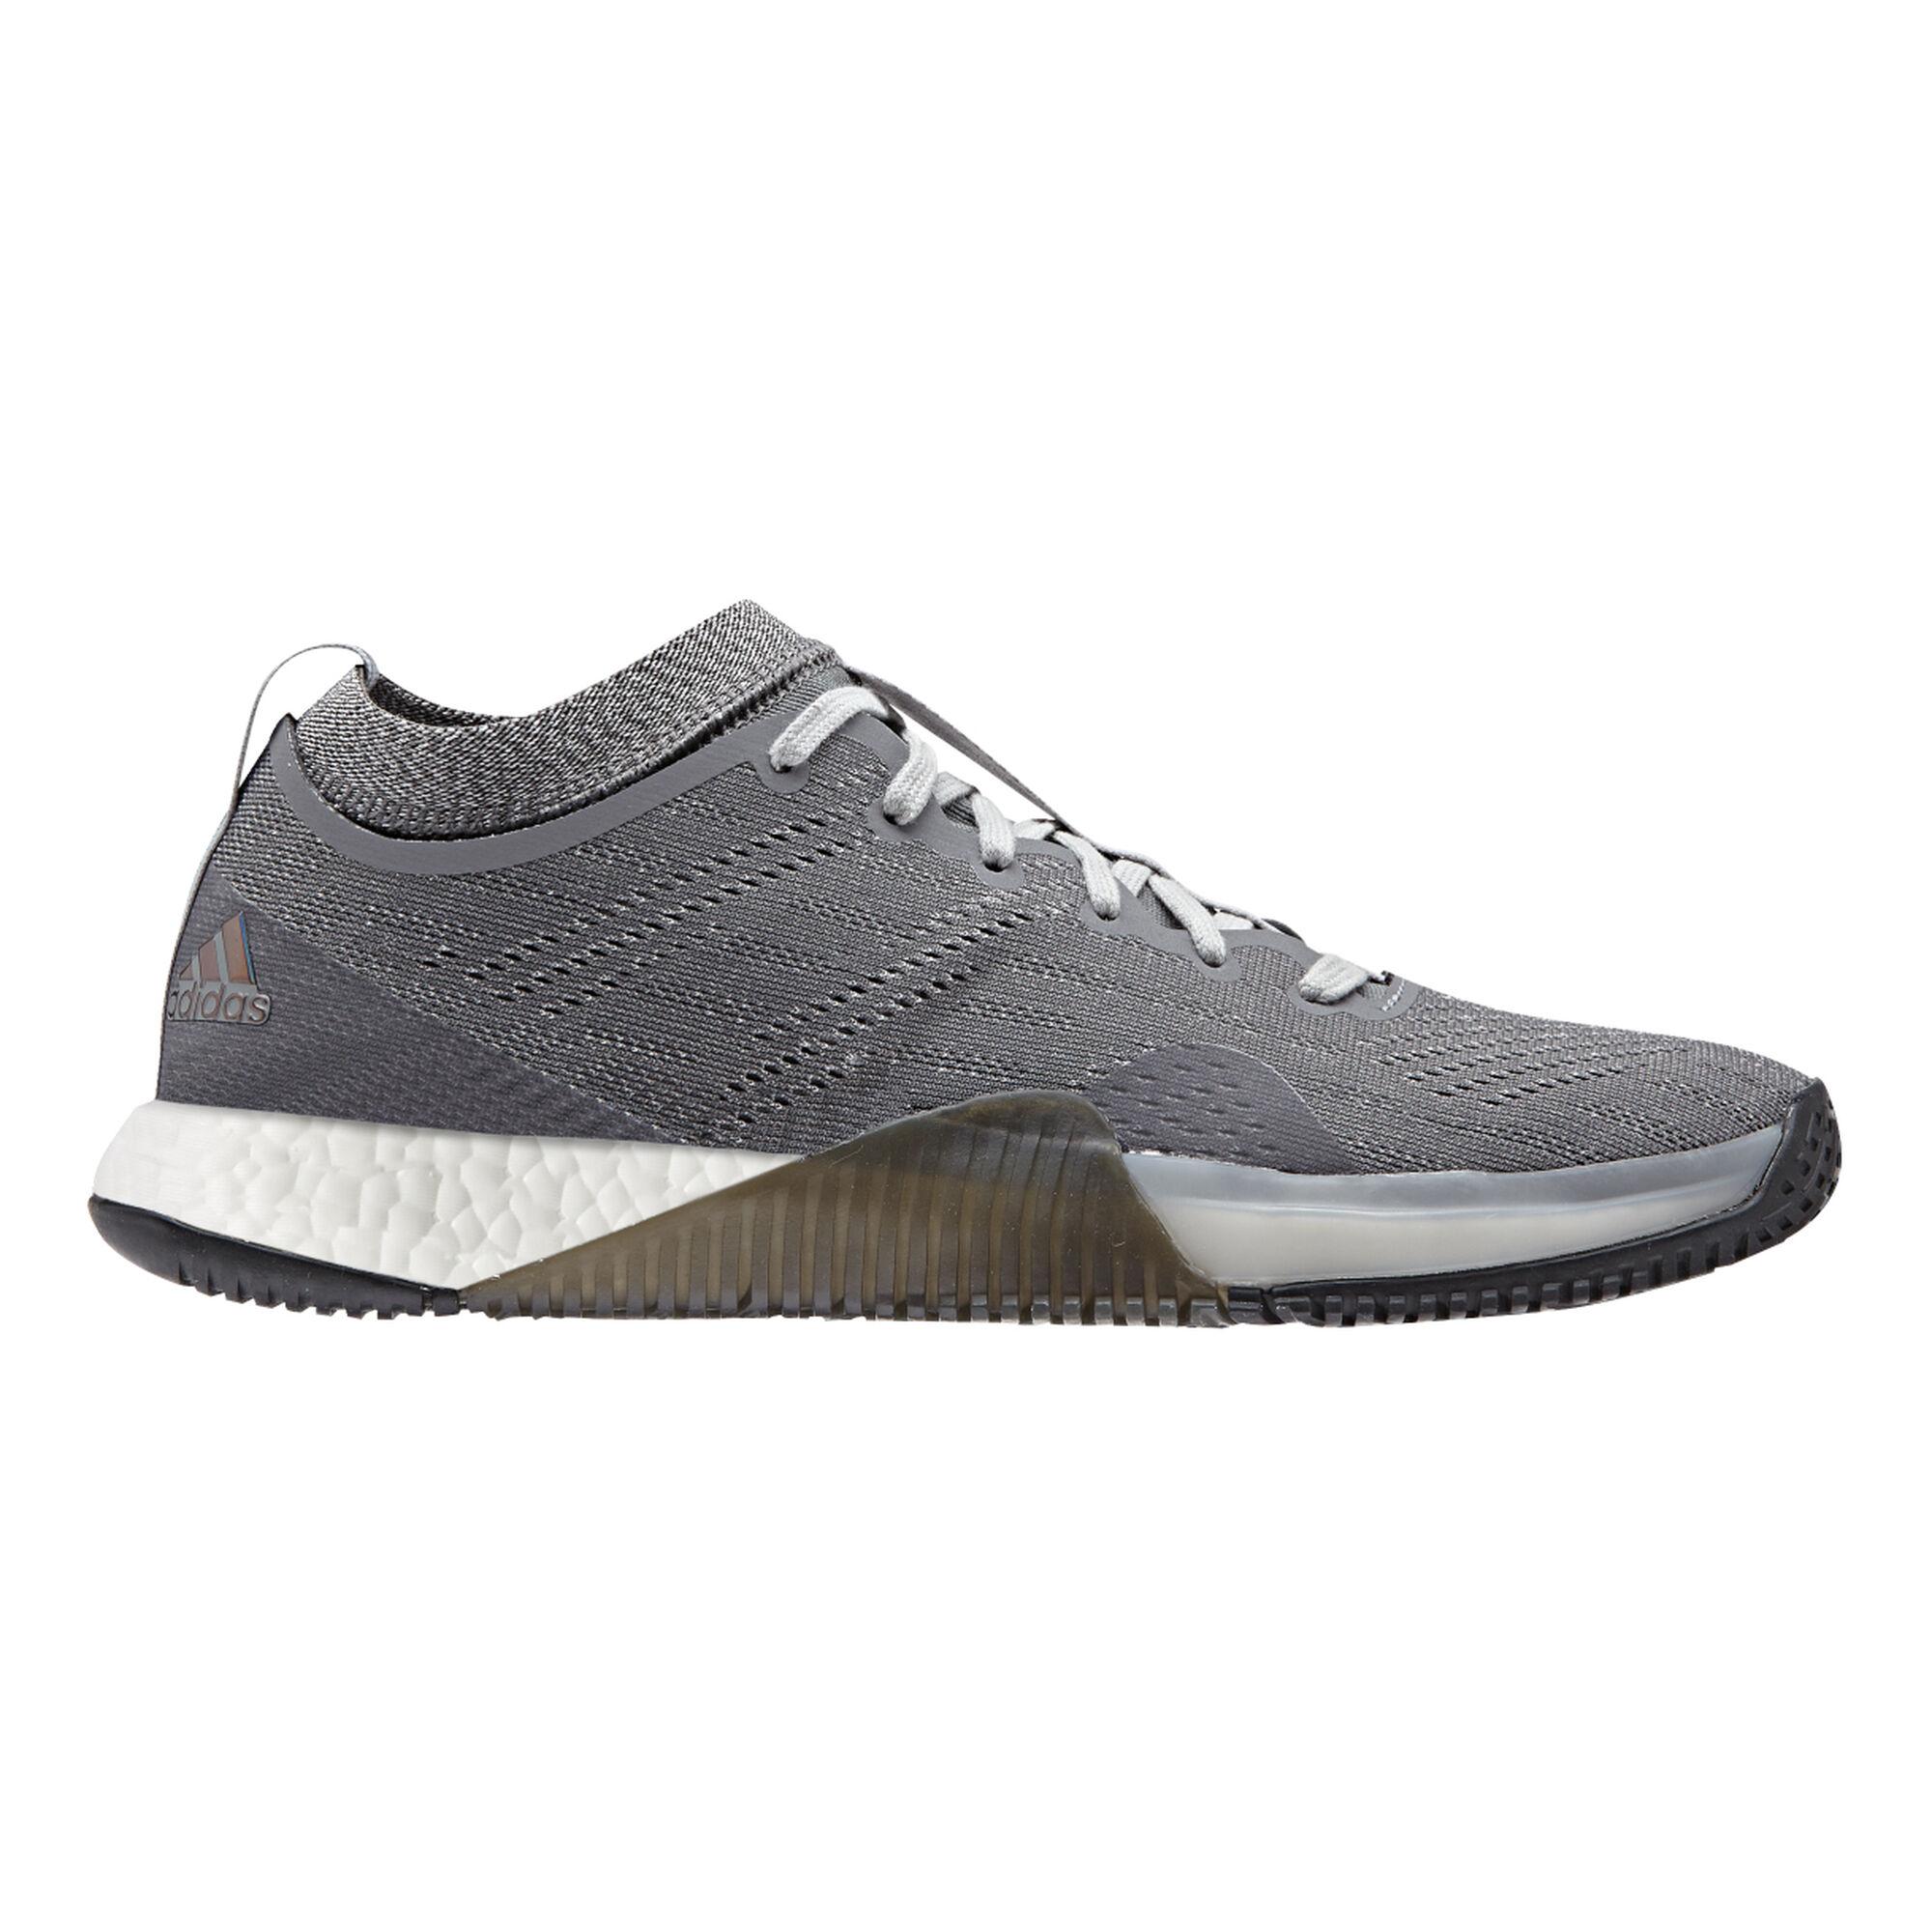 bab3a1a6d32 adidas · adidas · adidas · adidas · adidas · adidas · adidas · adidas. CrazyTrain  Elite Women ...